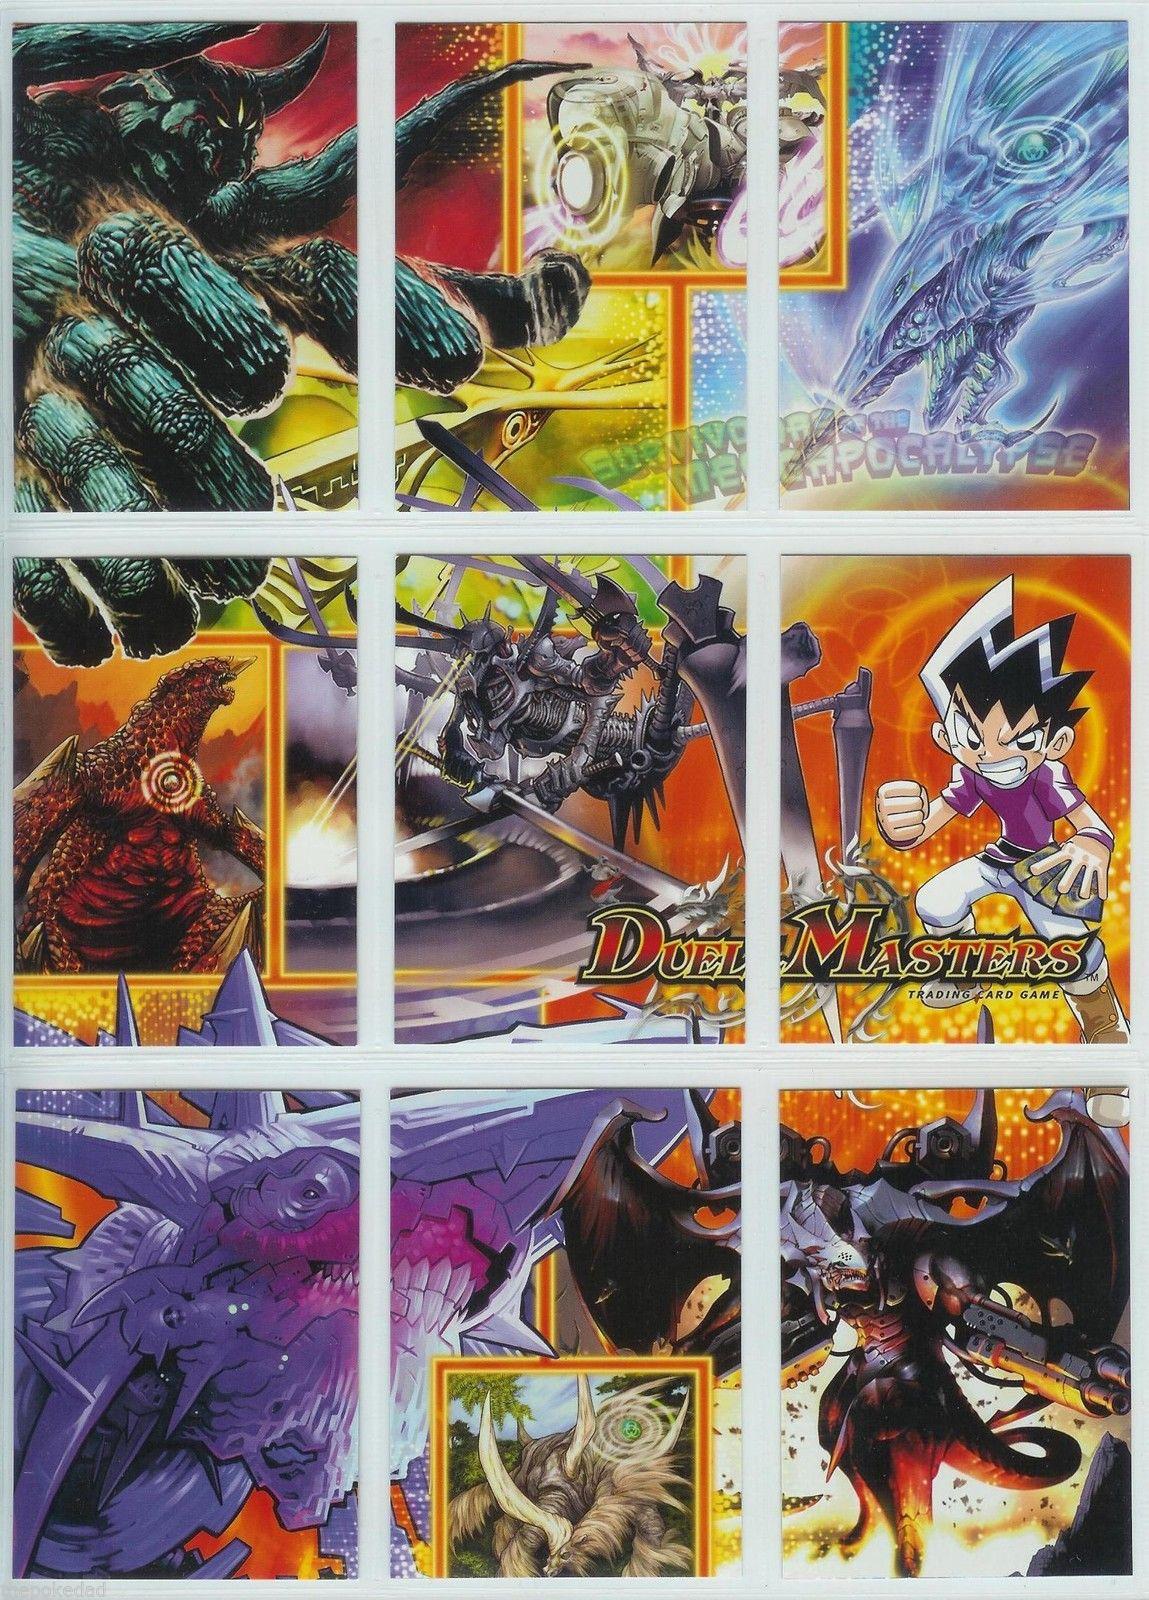 DUEL MASTERS Bolgash Dragon 37//55 DM-05 Survivors Of The Megapocalypse Card